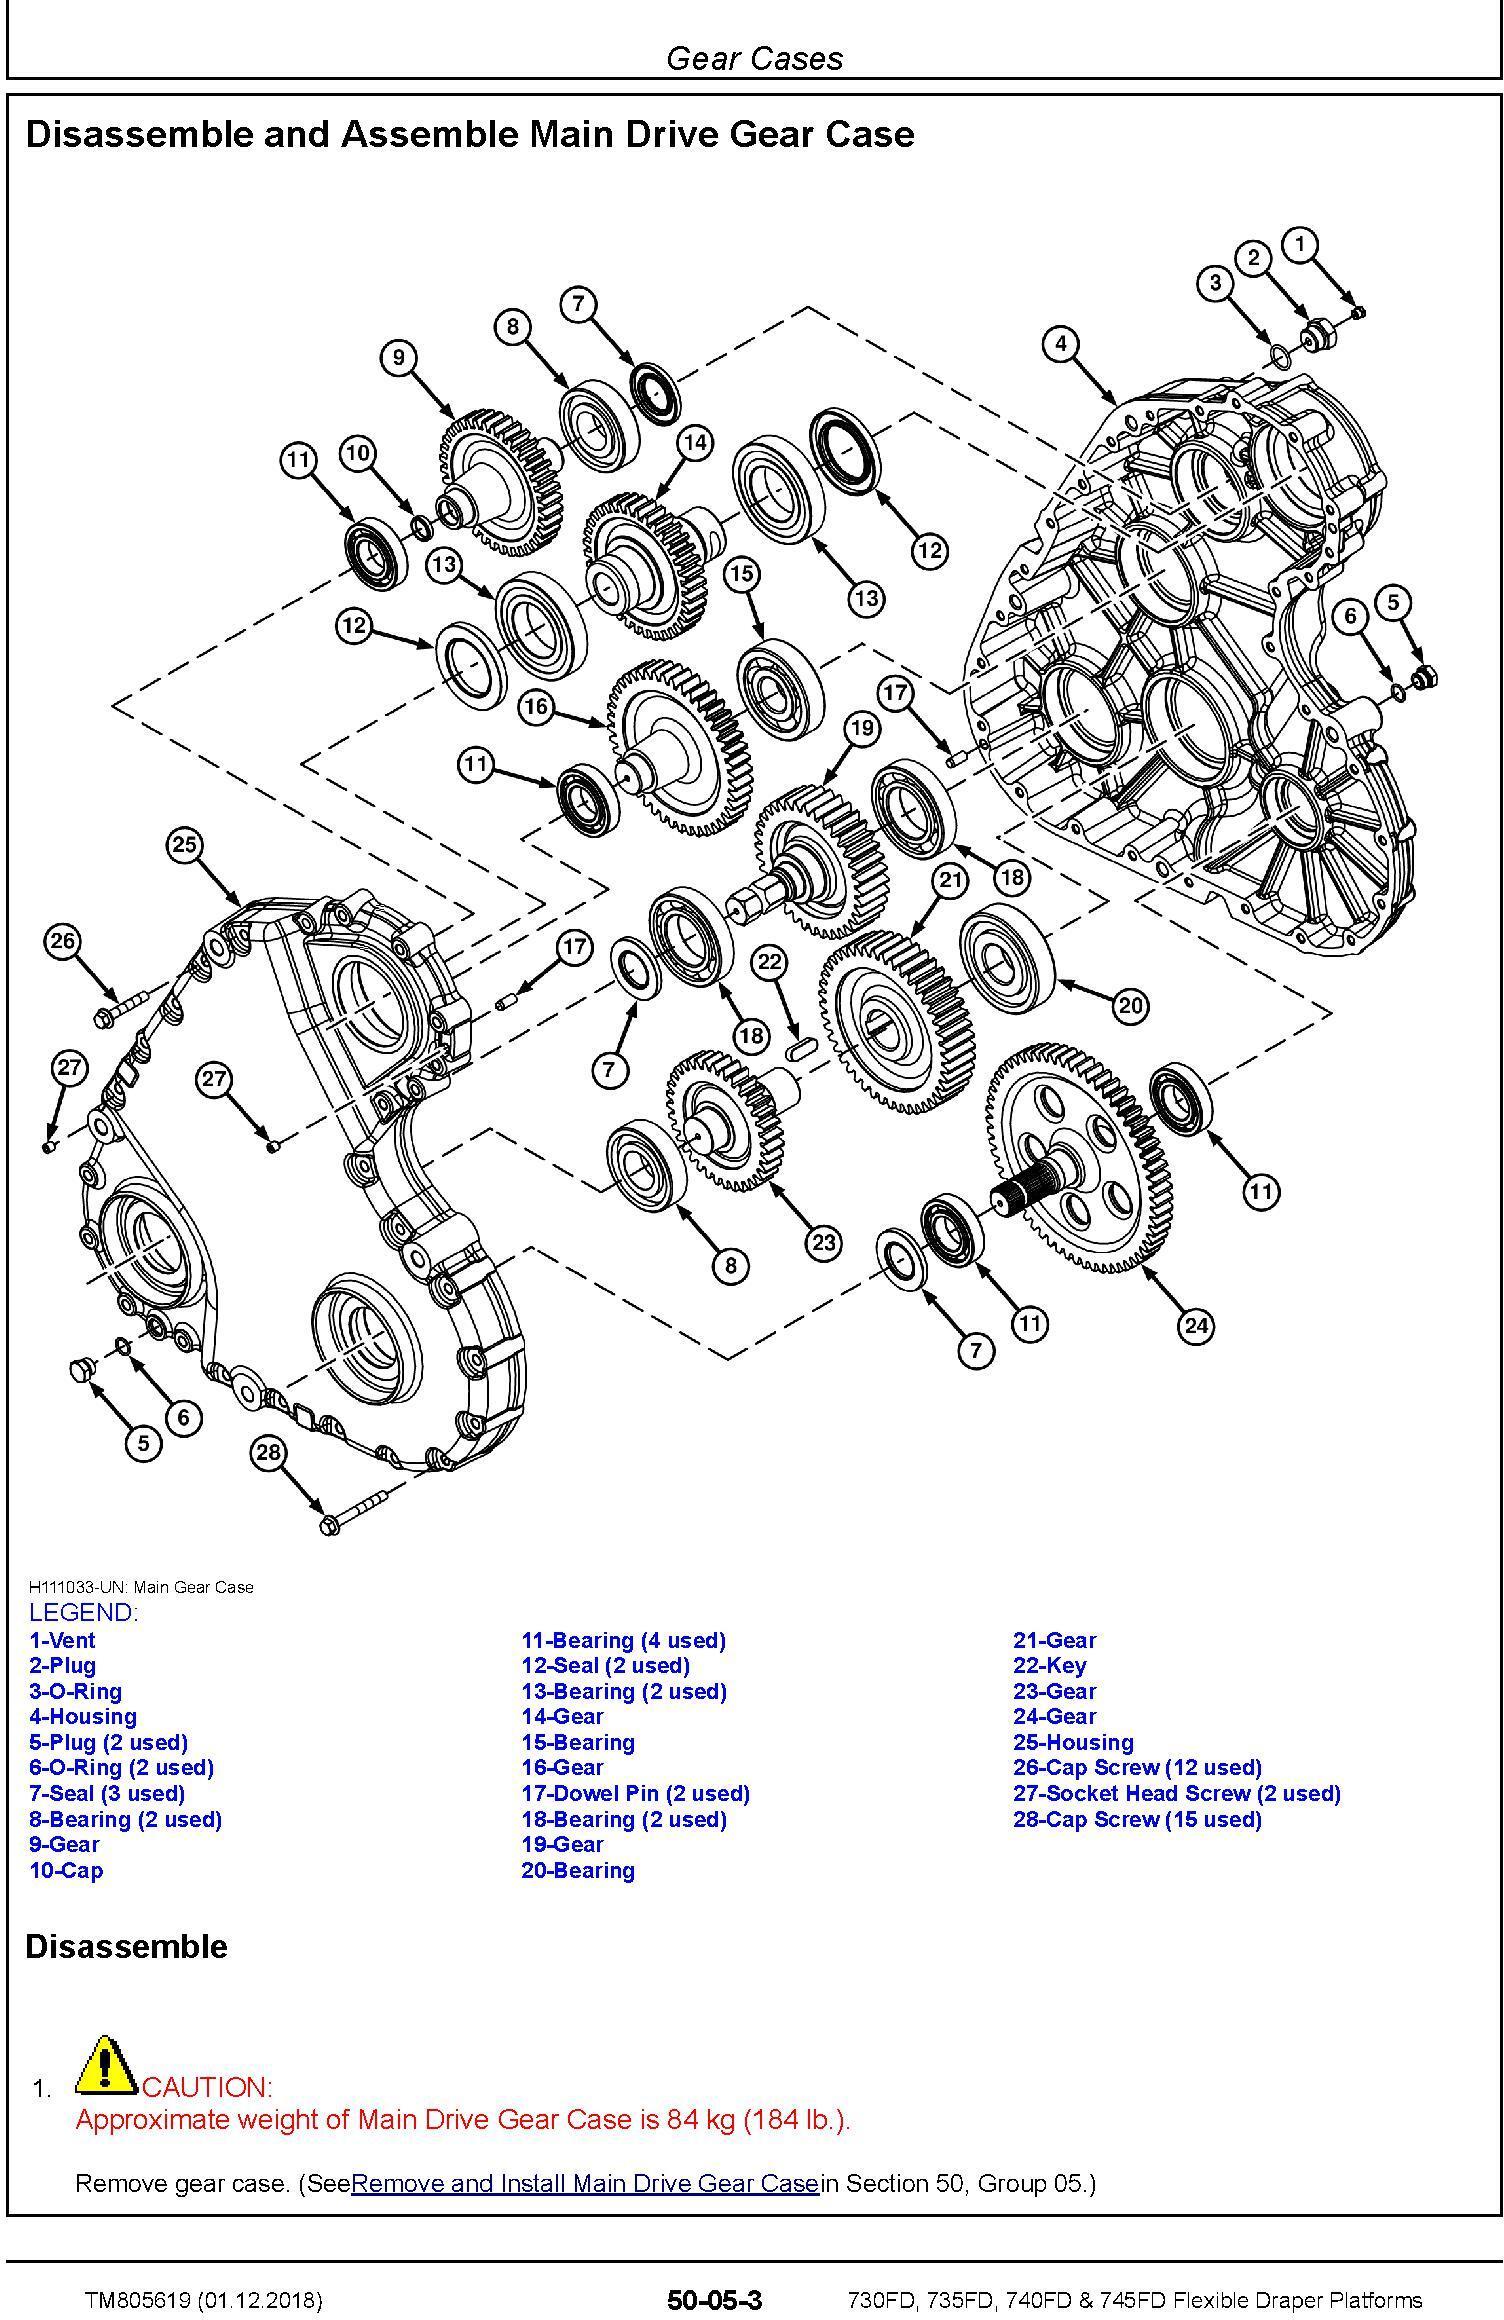 John Deere 730FD, 735FD, 740FD & 745FD Flexible Draper Platforms Repair Technical Manual (TM805619) - 1